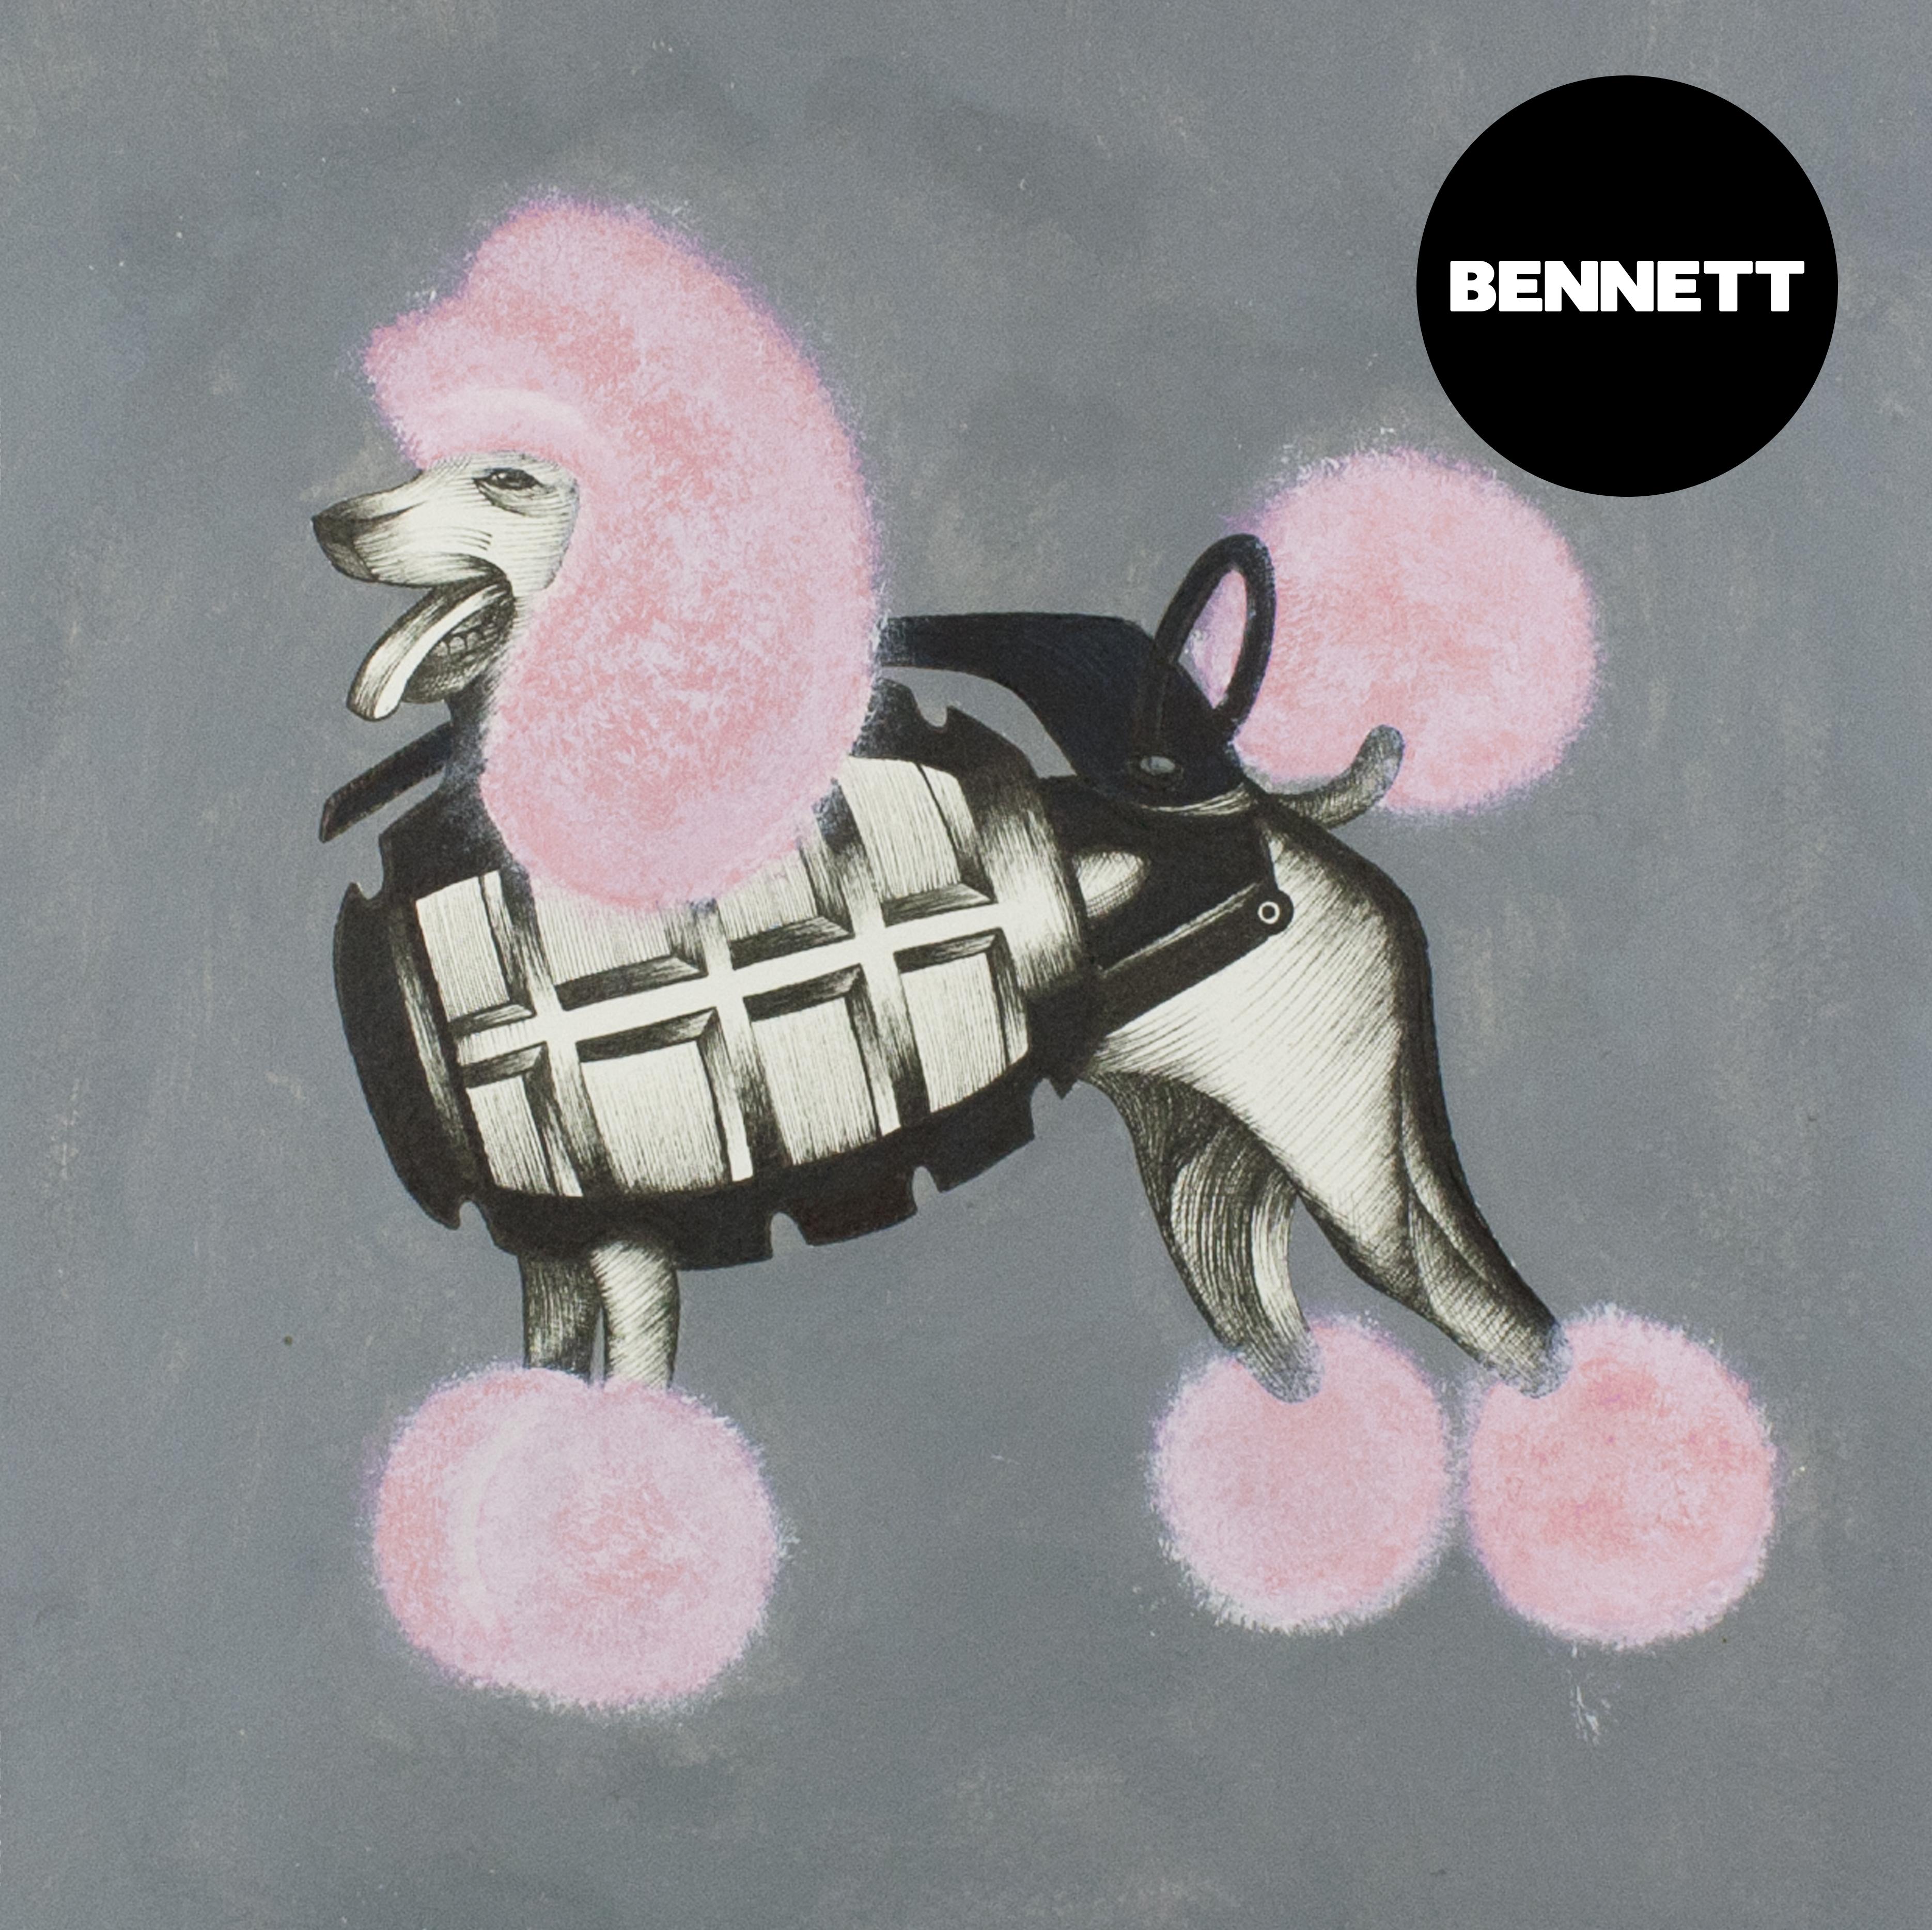 Bennett - s/t LP